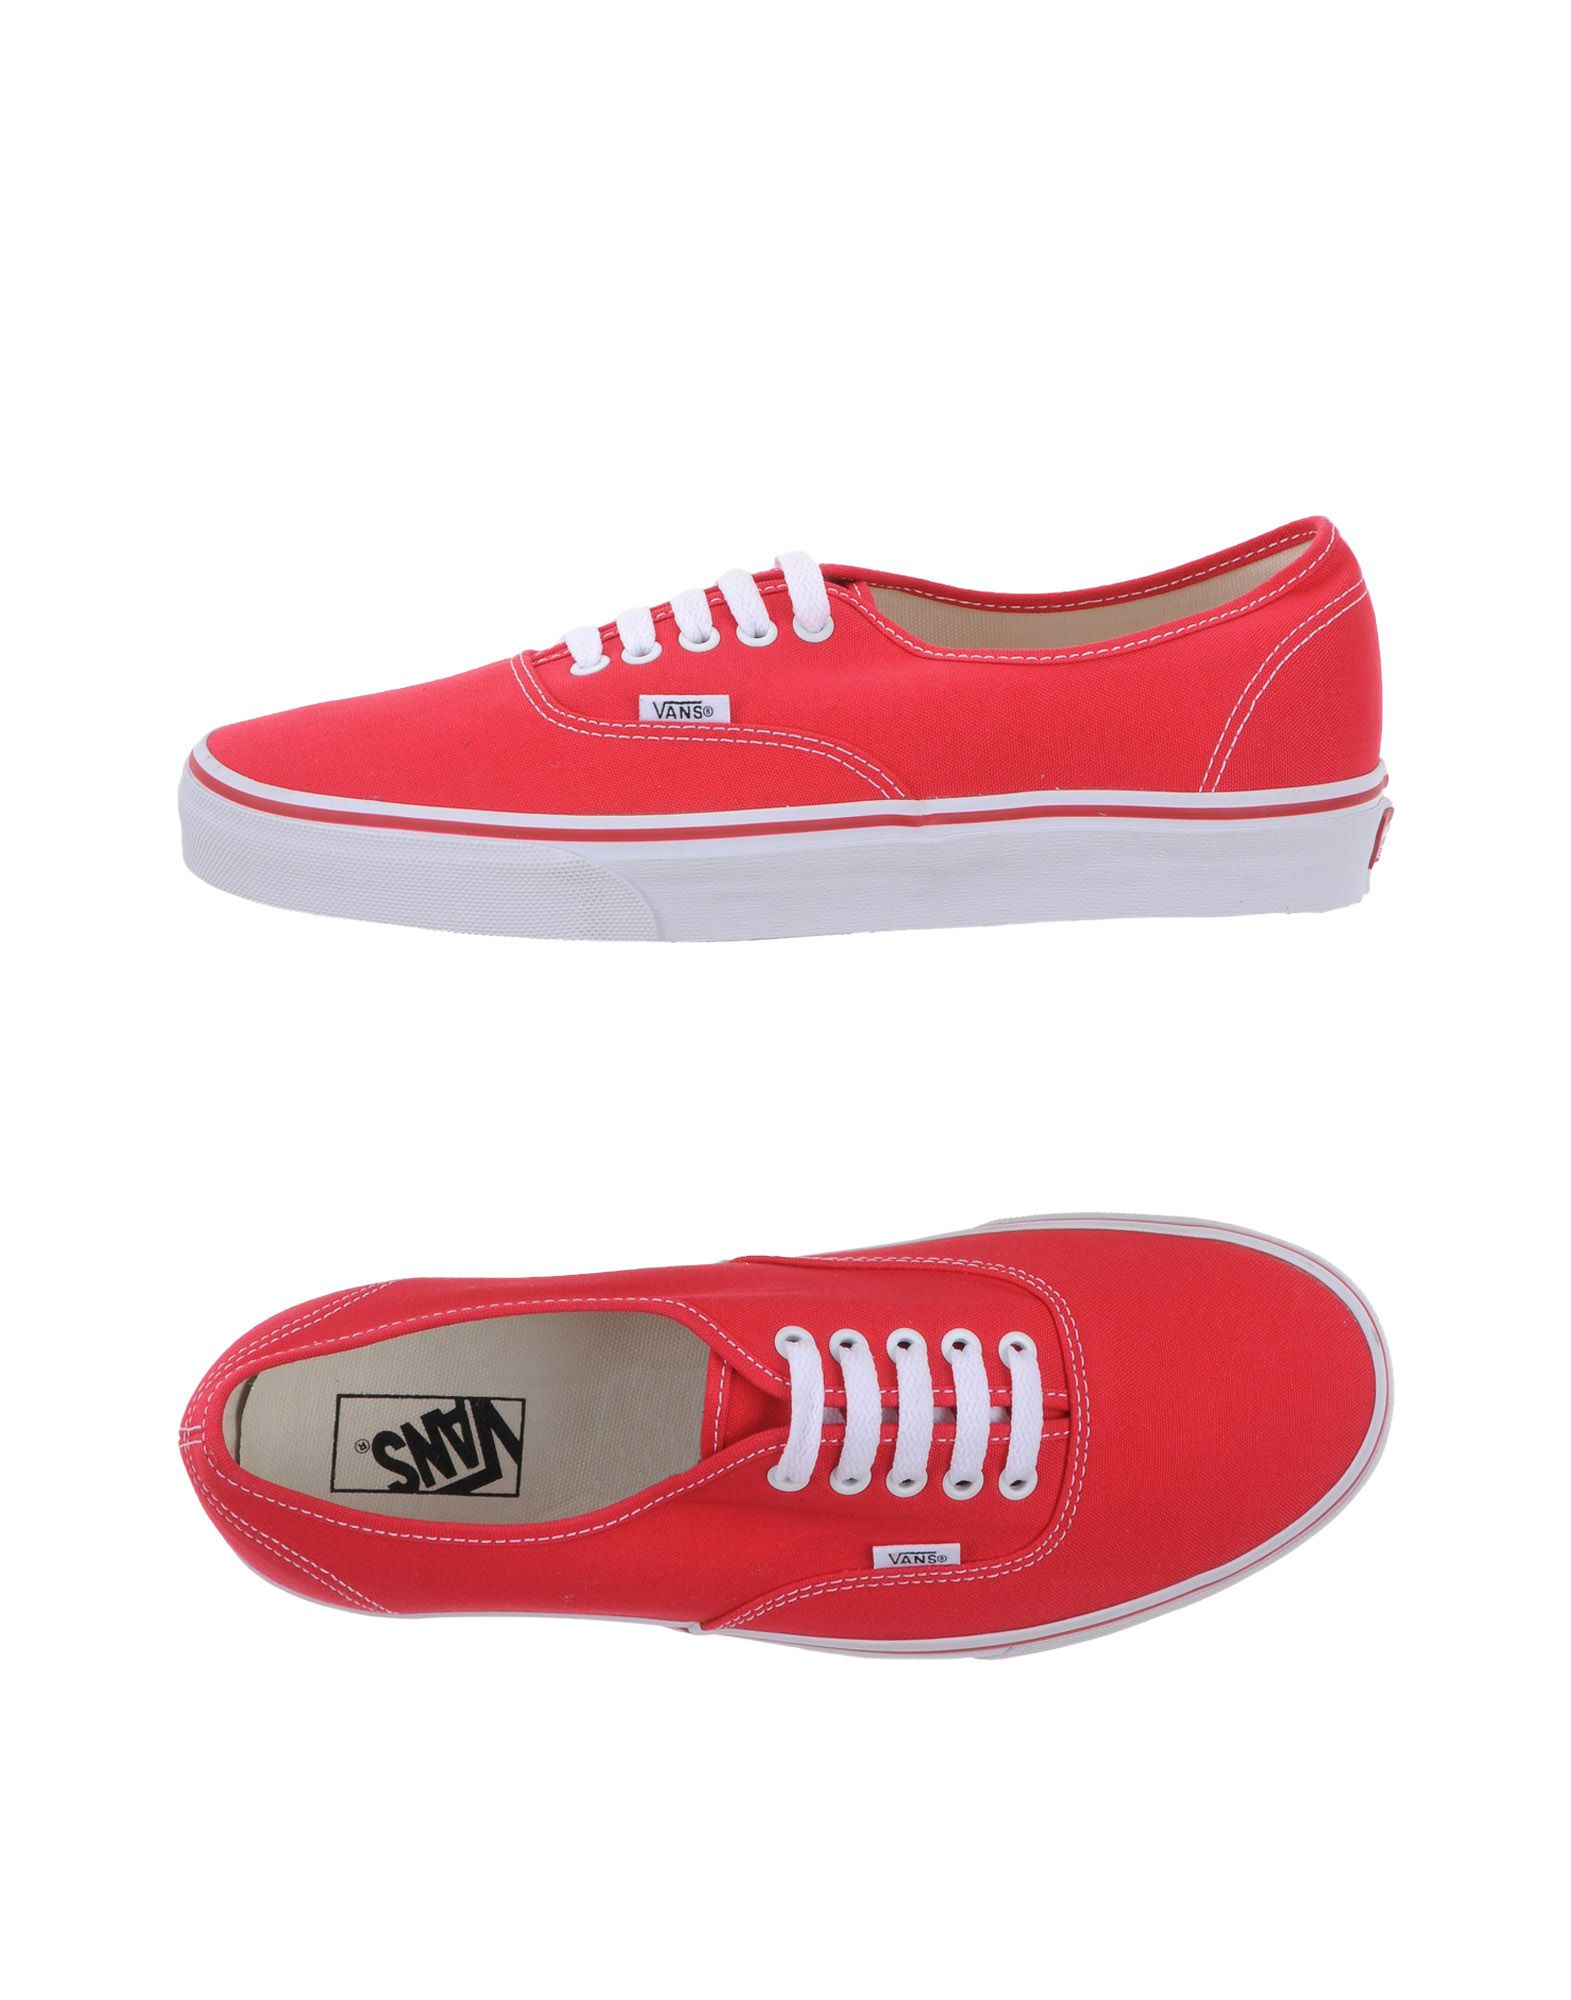 Sneakers Sneakers Sneakers Vans Homme - Sneakers Vans  Rouge Super rabais e1b966